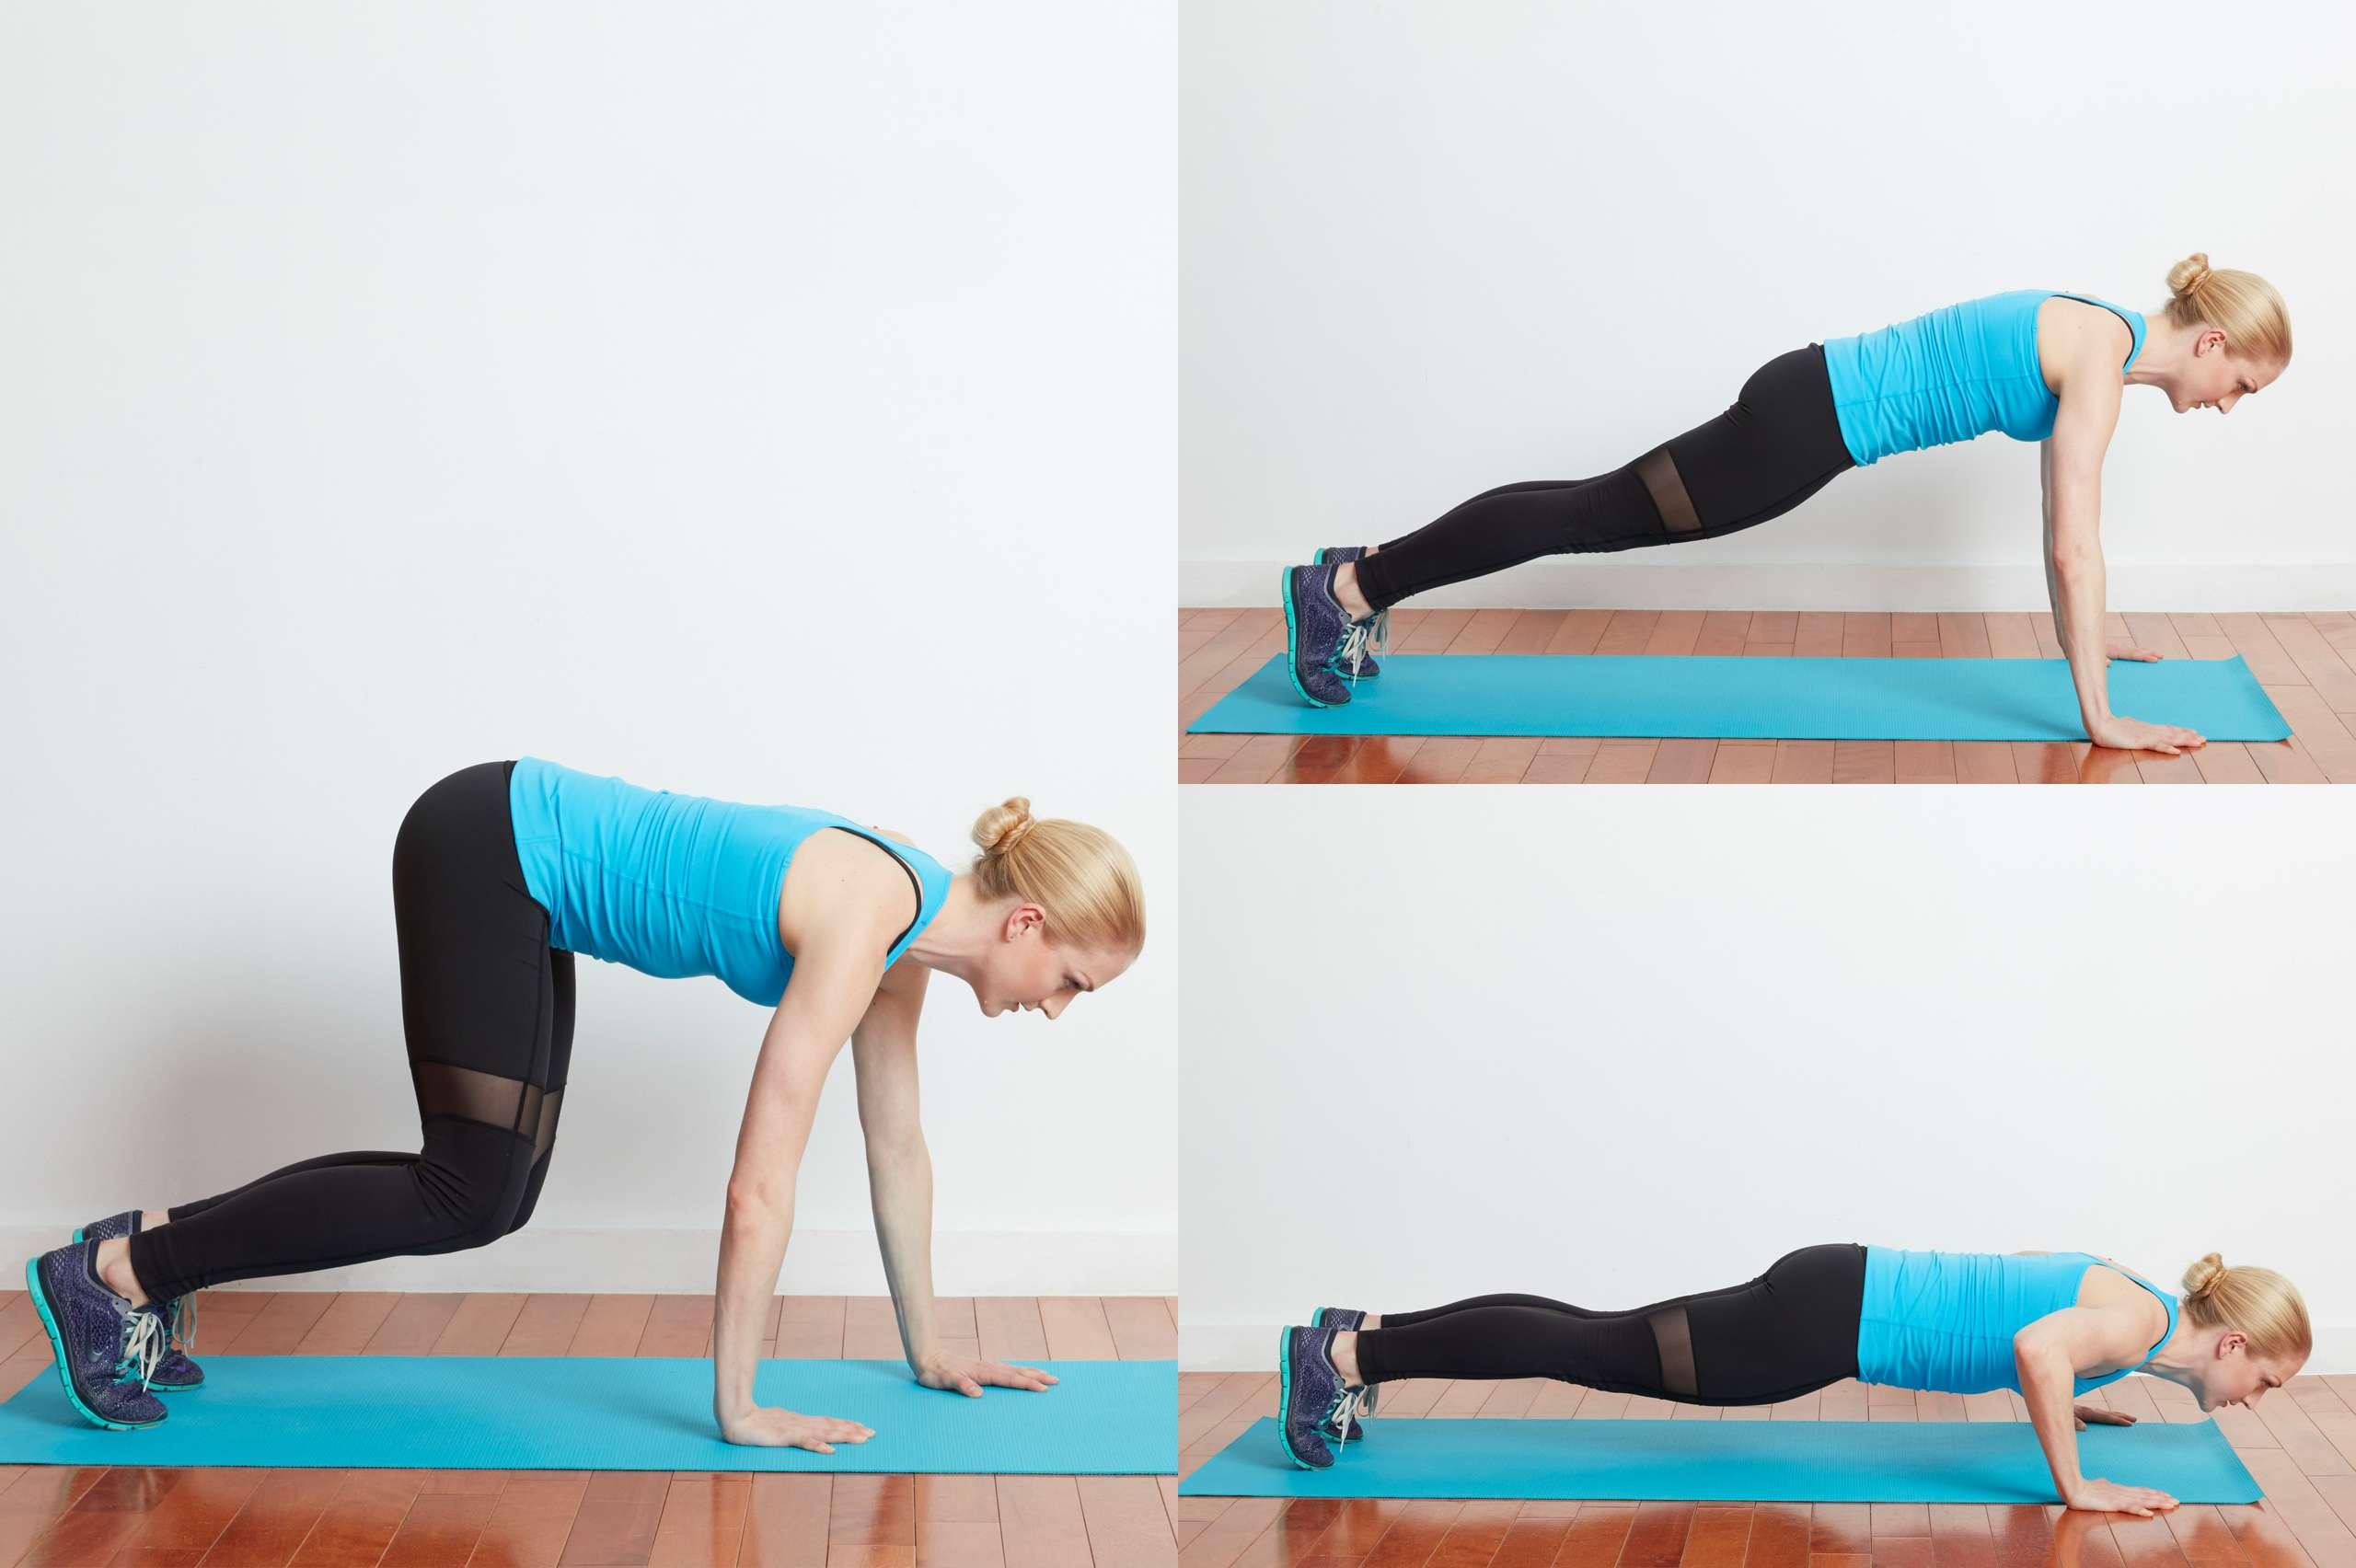 Woman doing bear crawl exercise